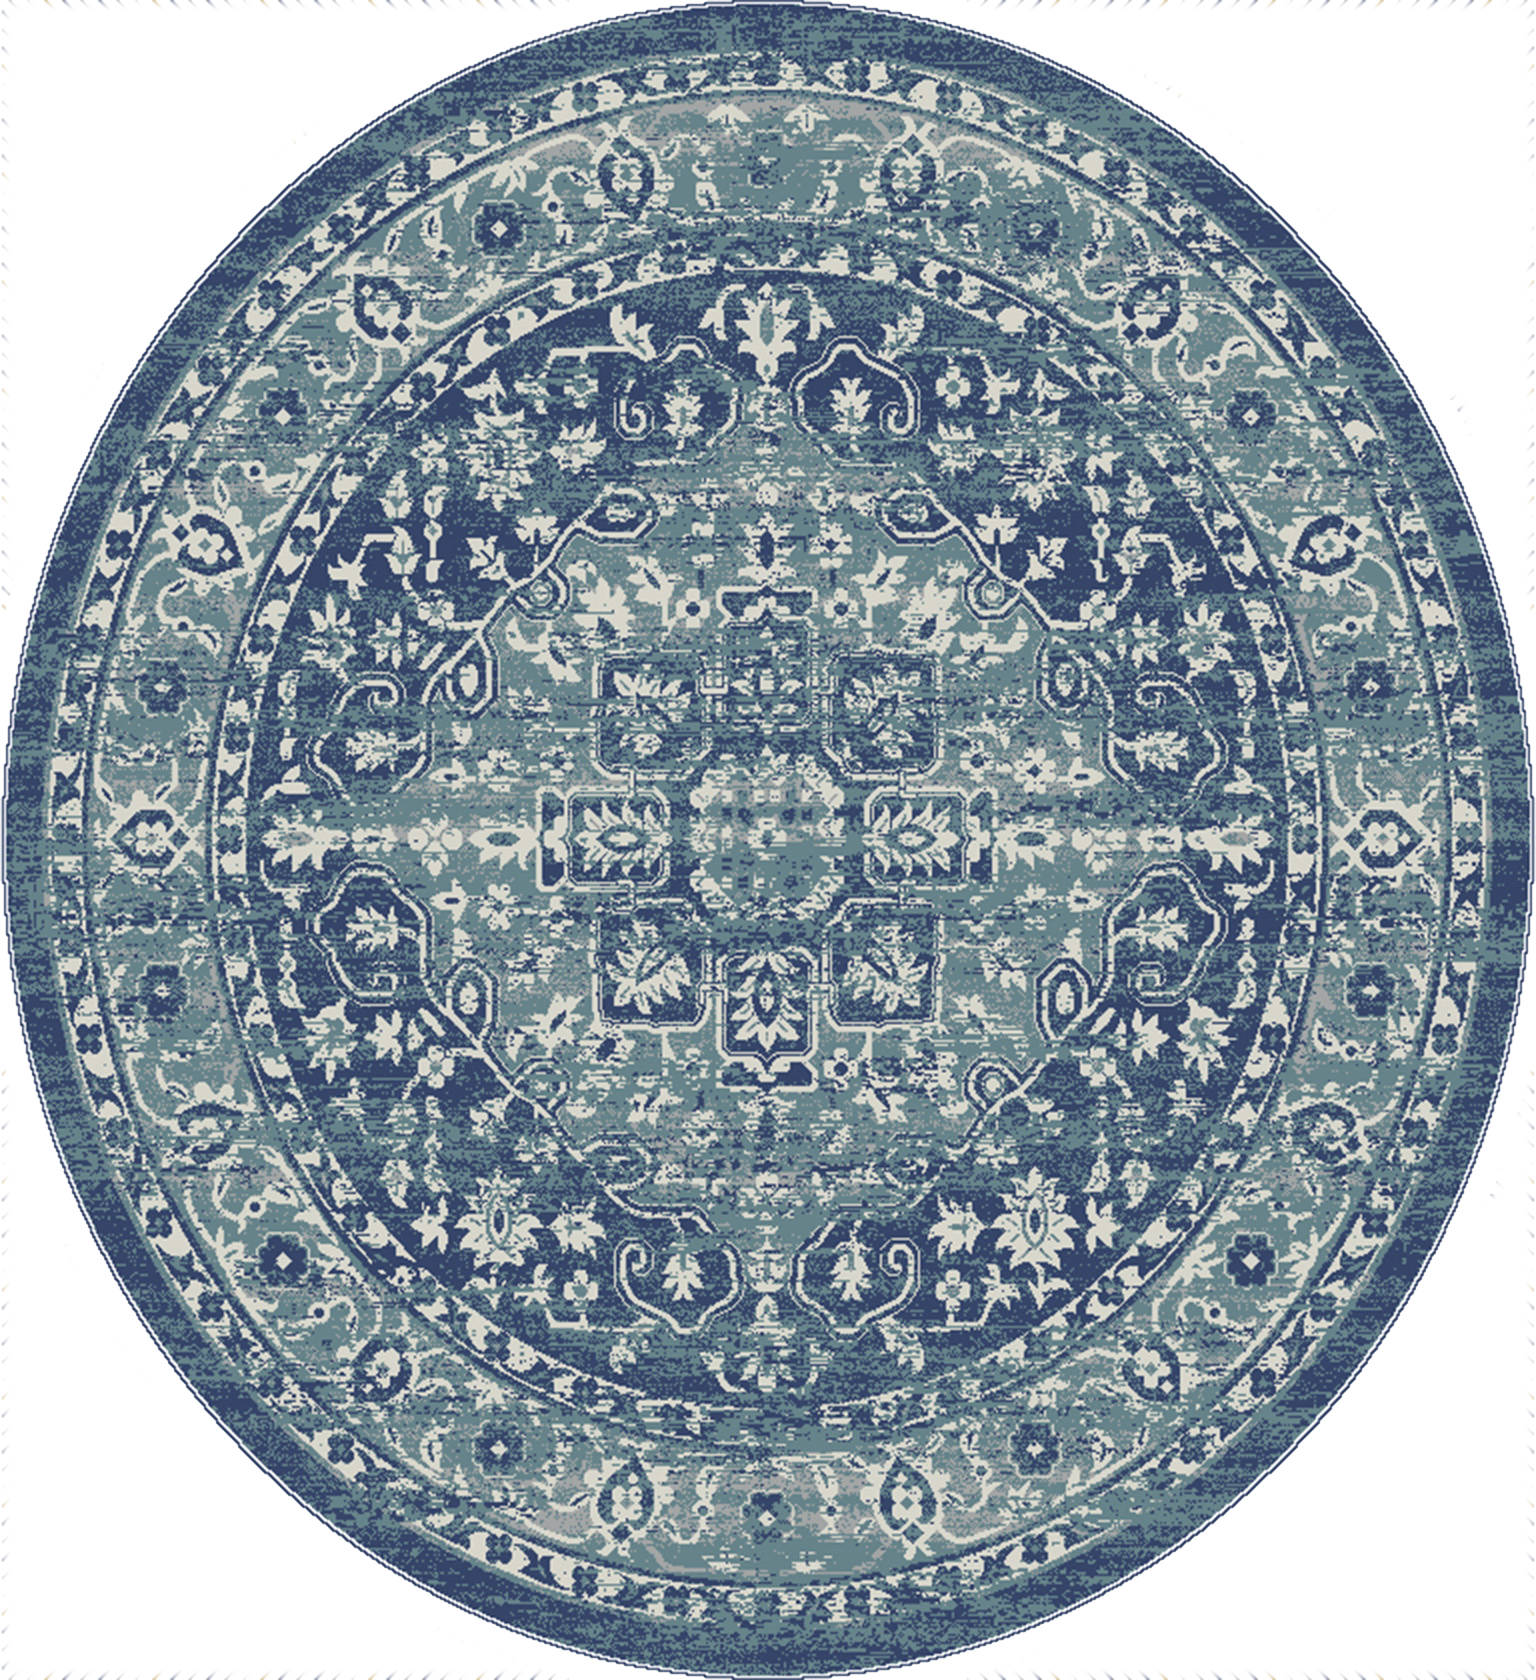 United Weavers Bali Blue Round 7 To 8 Ft Olefin Carpet 123452 Sku 123452